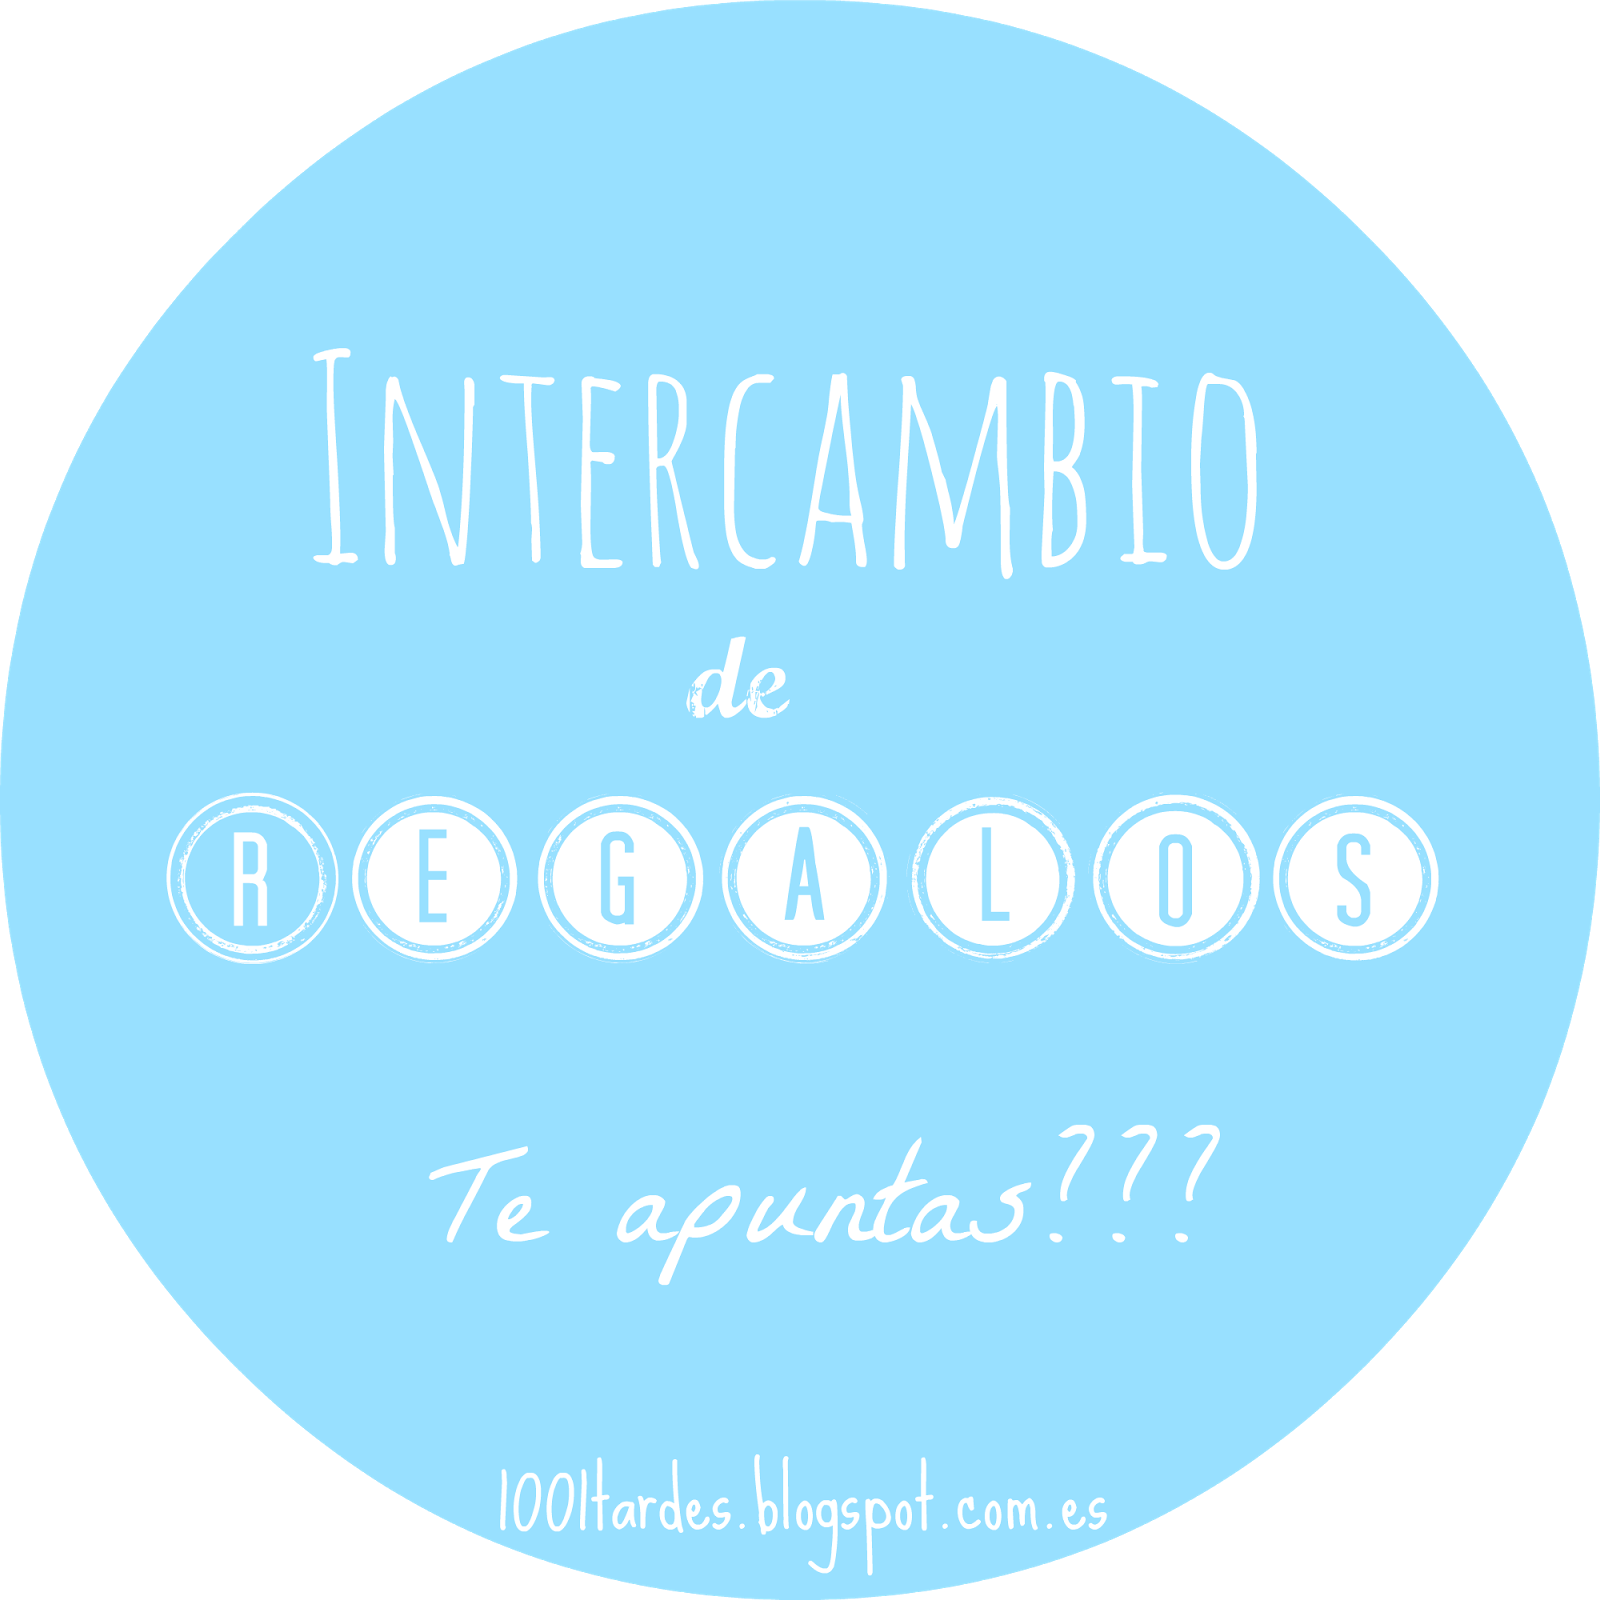 http://1001tardes.blogspot.com.es/2014/03/123intercambio.html